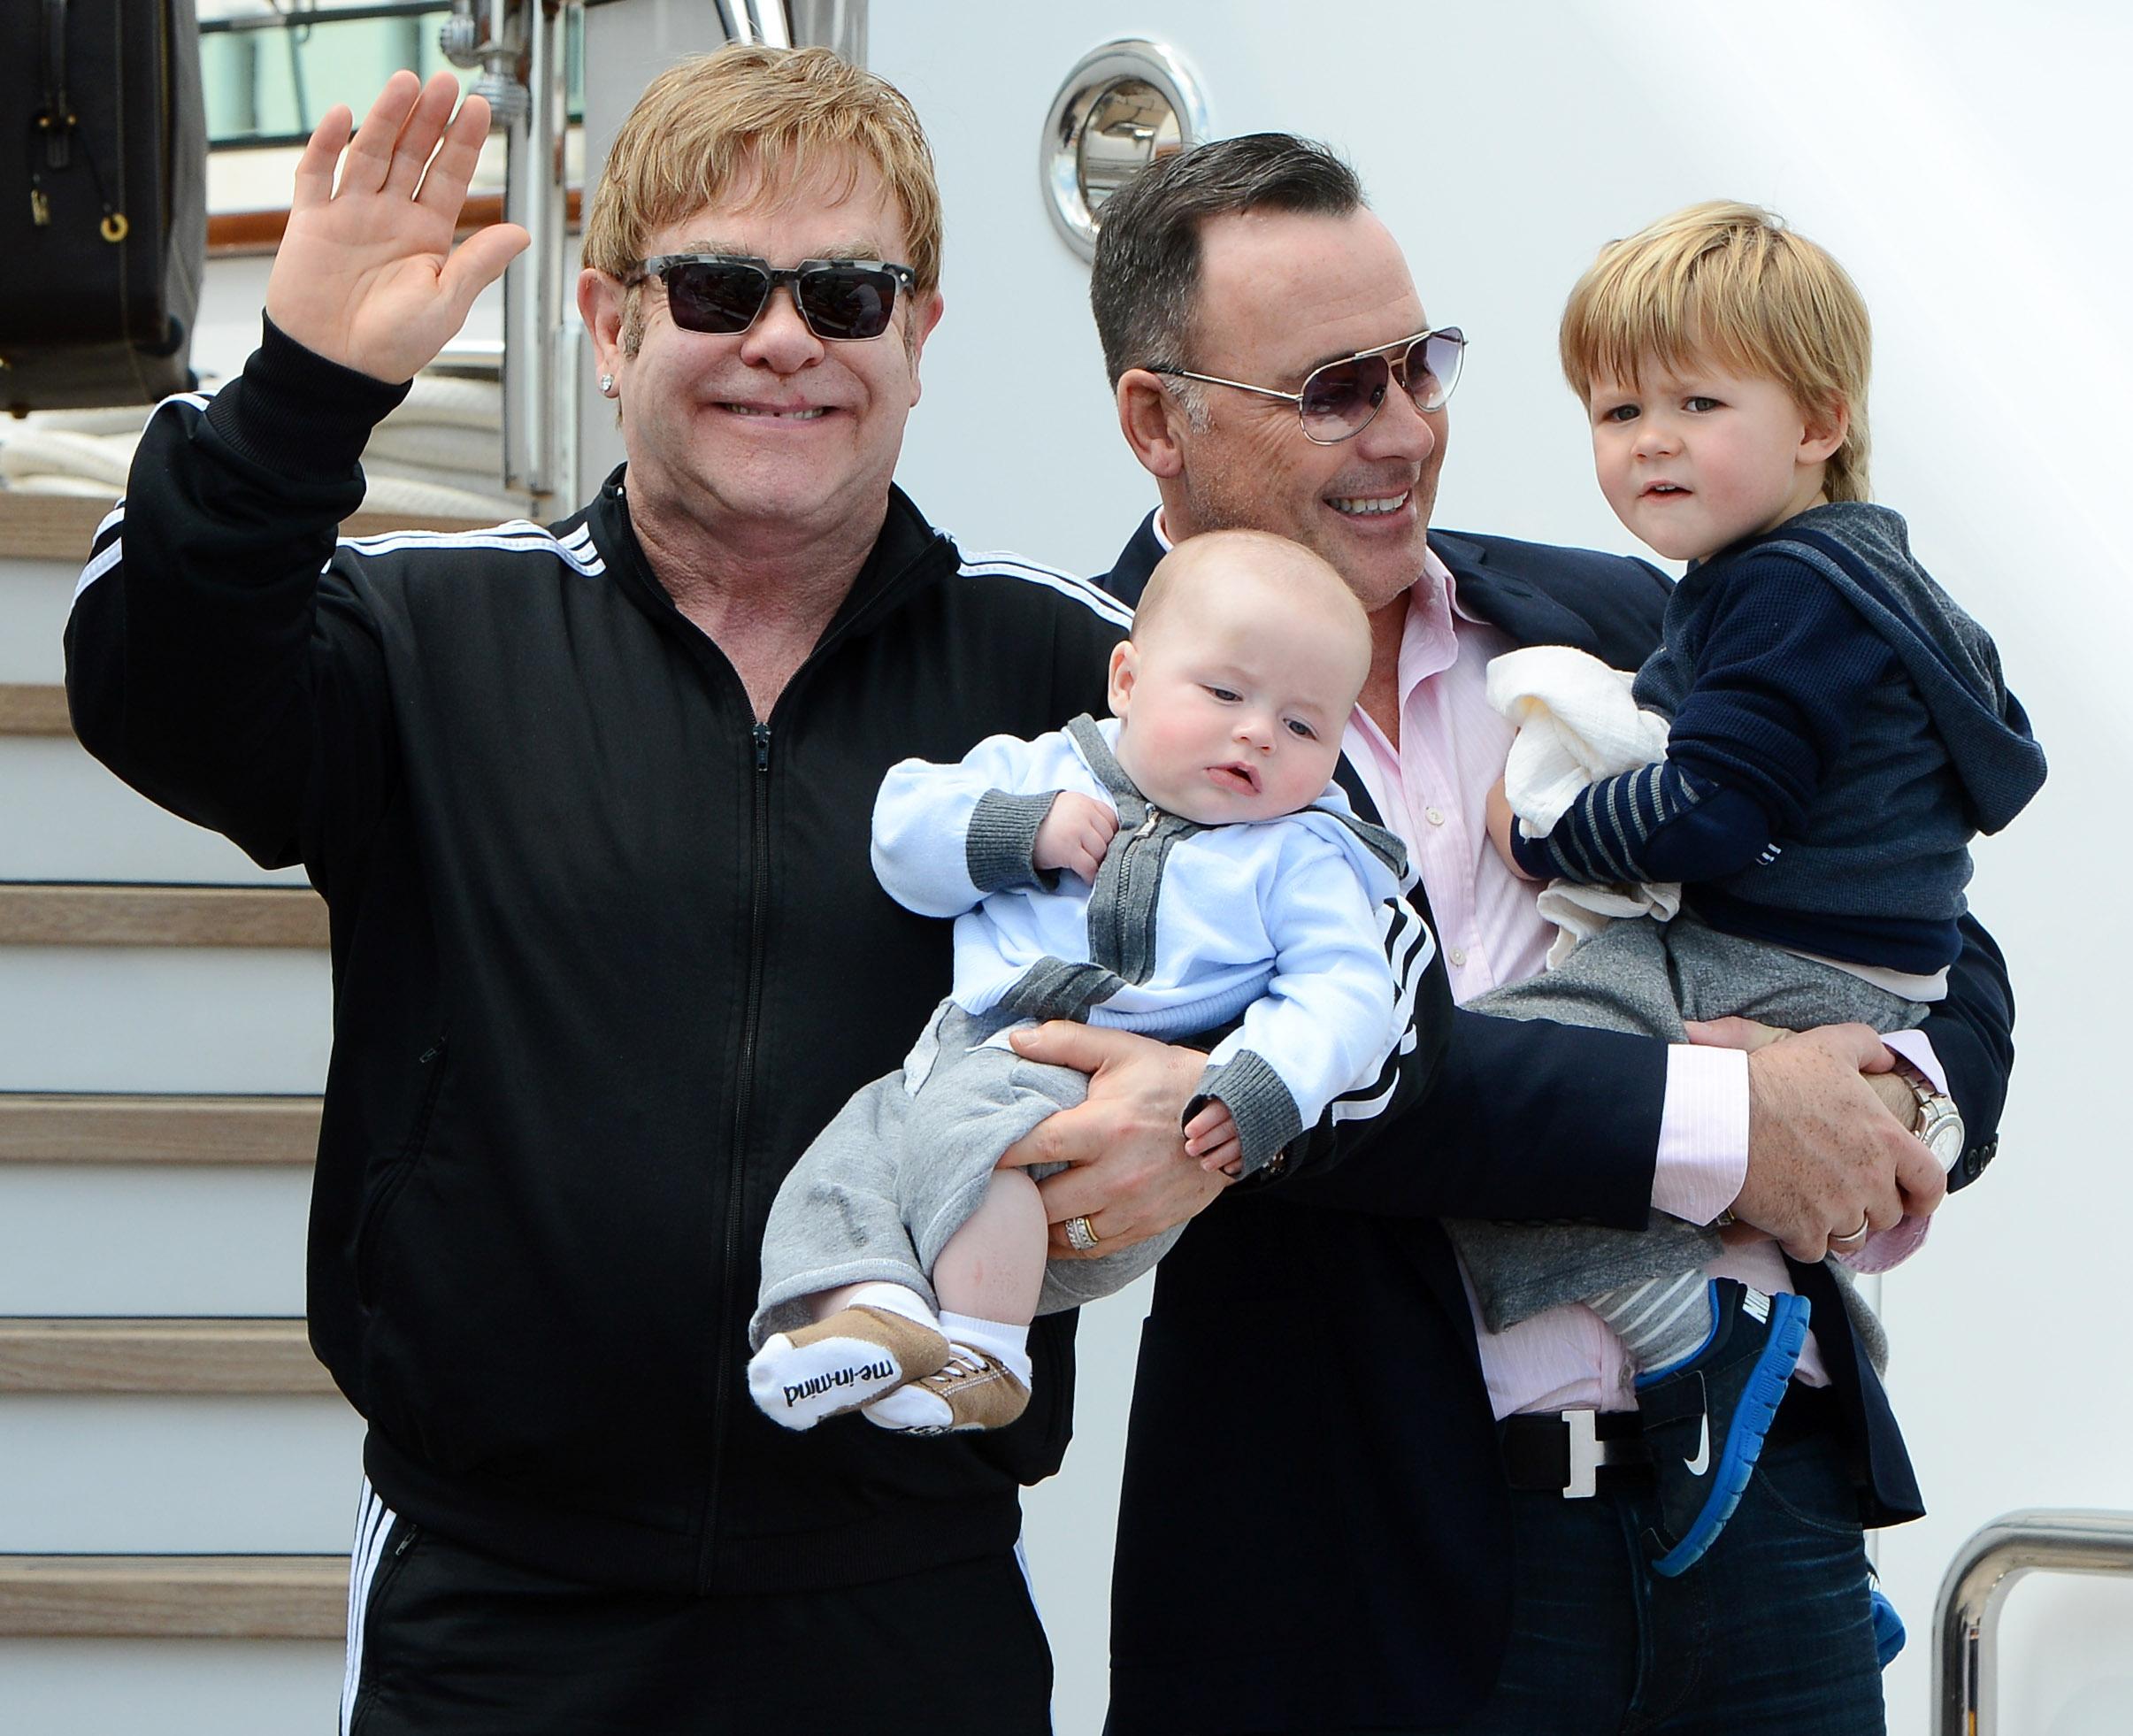 Elton John & David Furnish With Their Sons In Venice